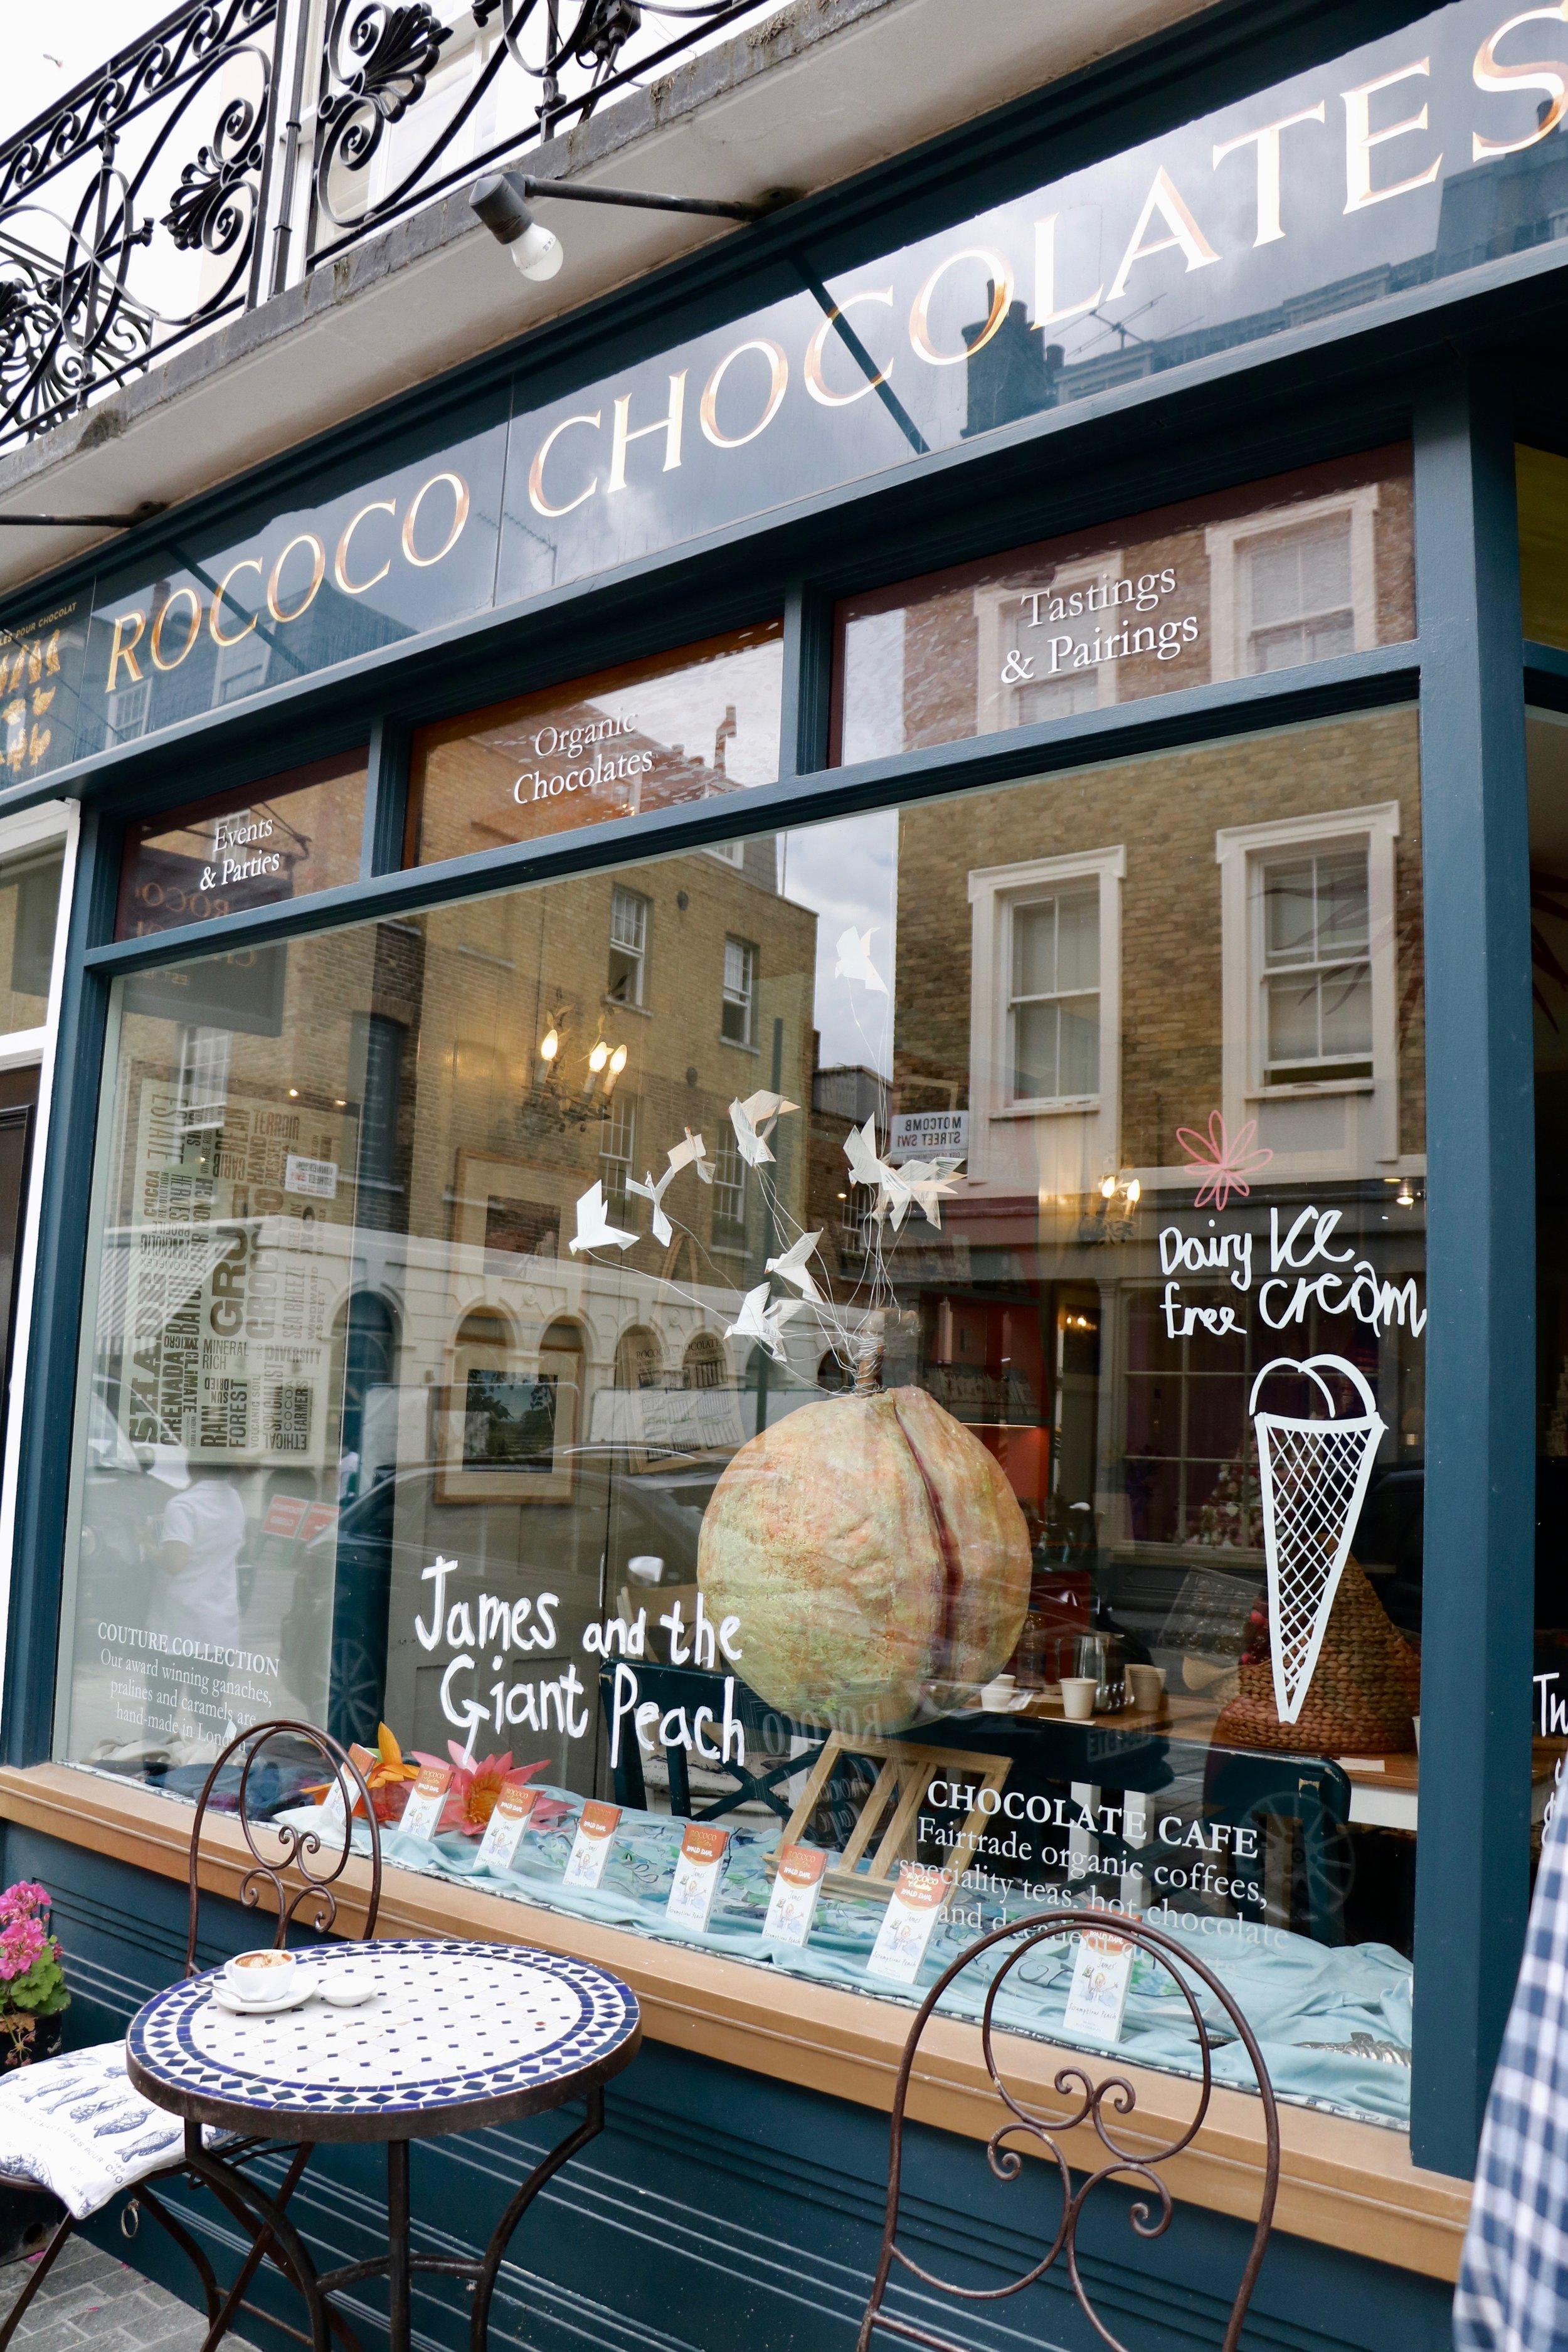 Rococo_chocolates_London_shop_exterior